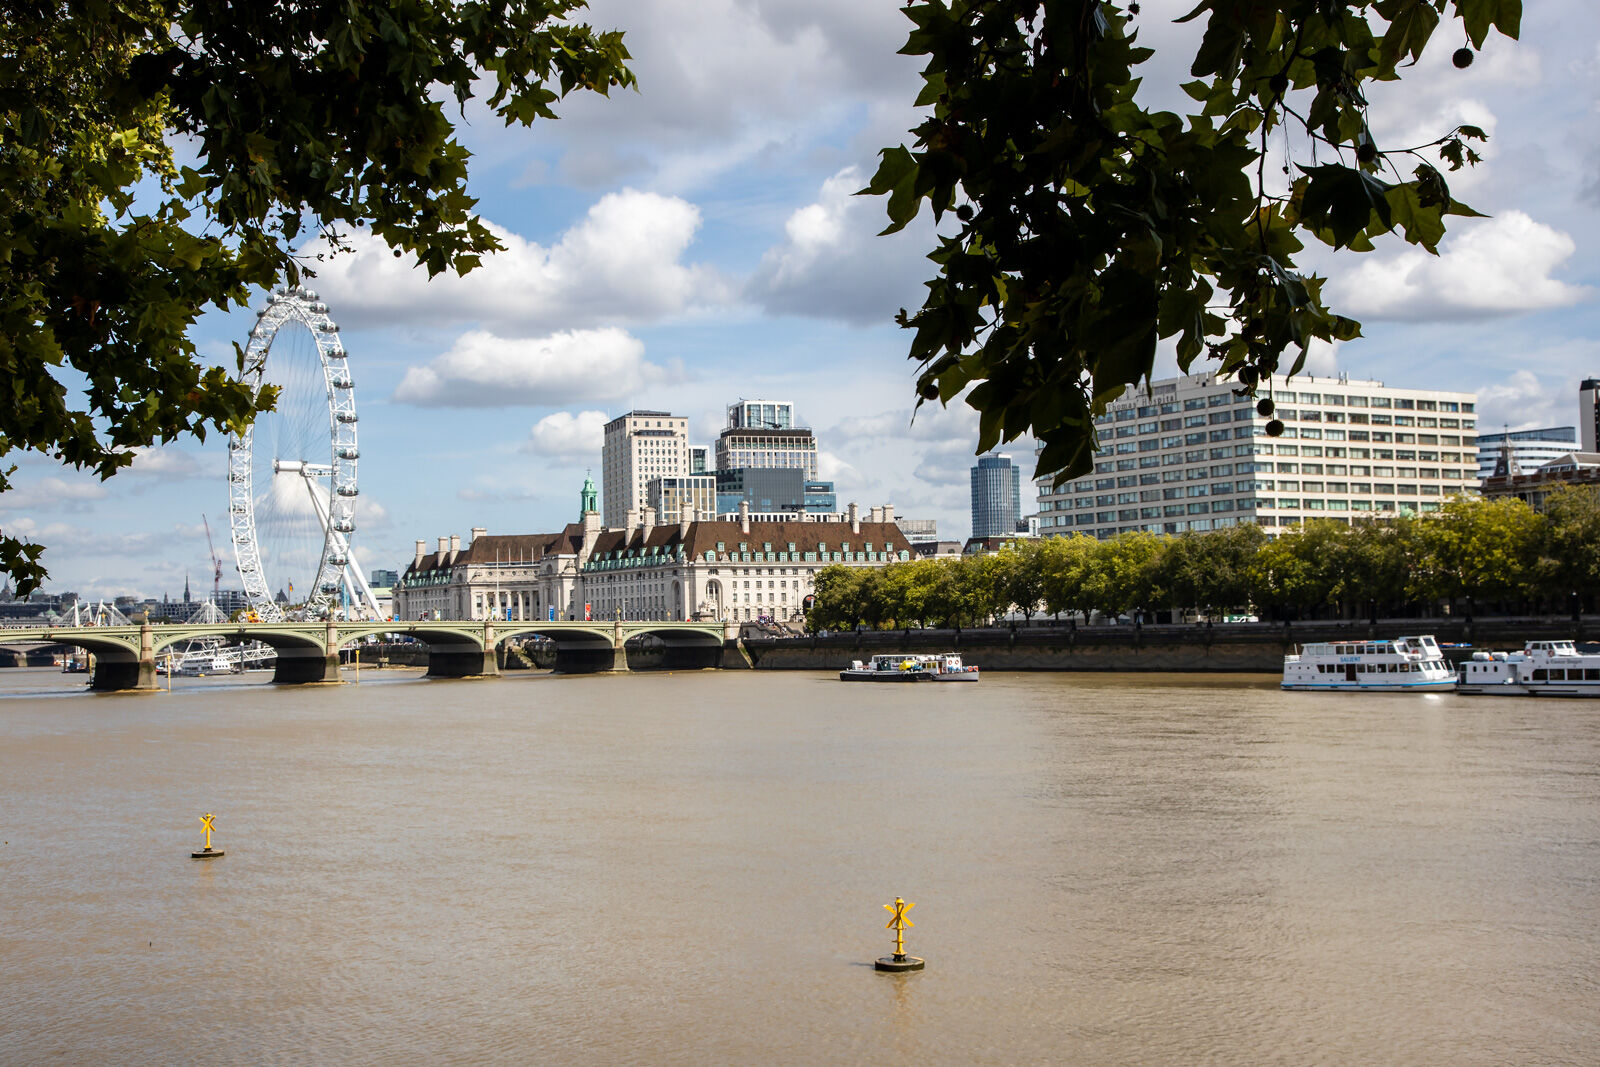 Westminster & London Eye